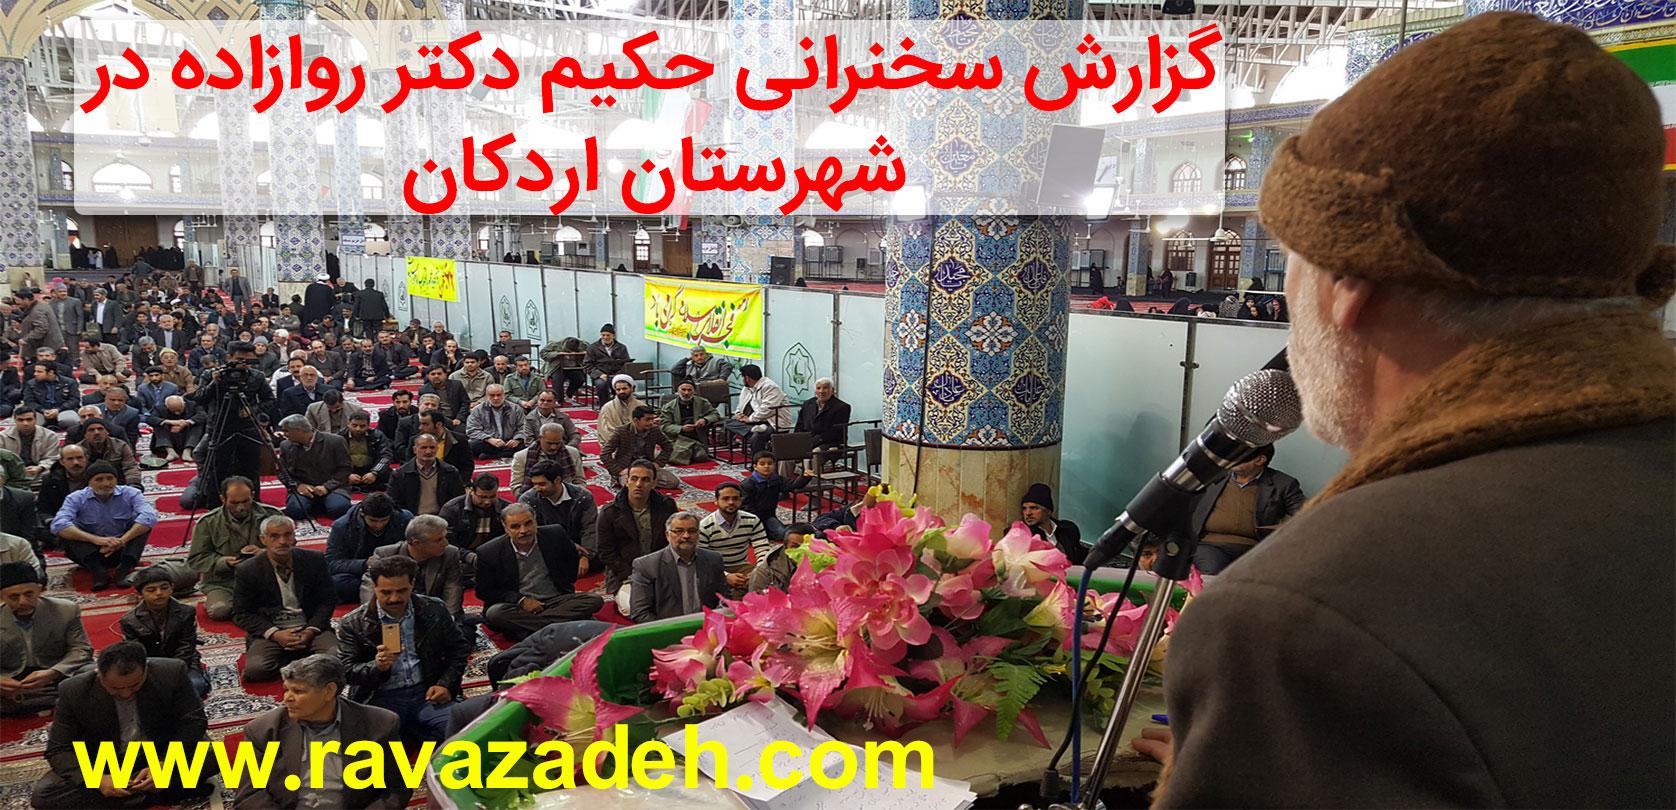 Photo of گزارش سخنرانی حکیم دکتر روازاده در شهرستان اردکان + تصاویر